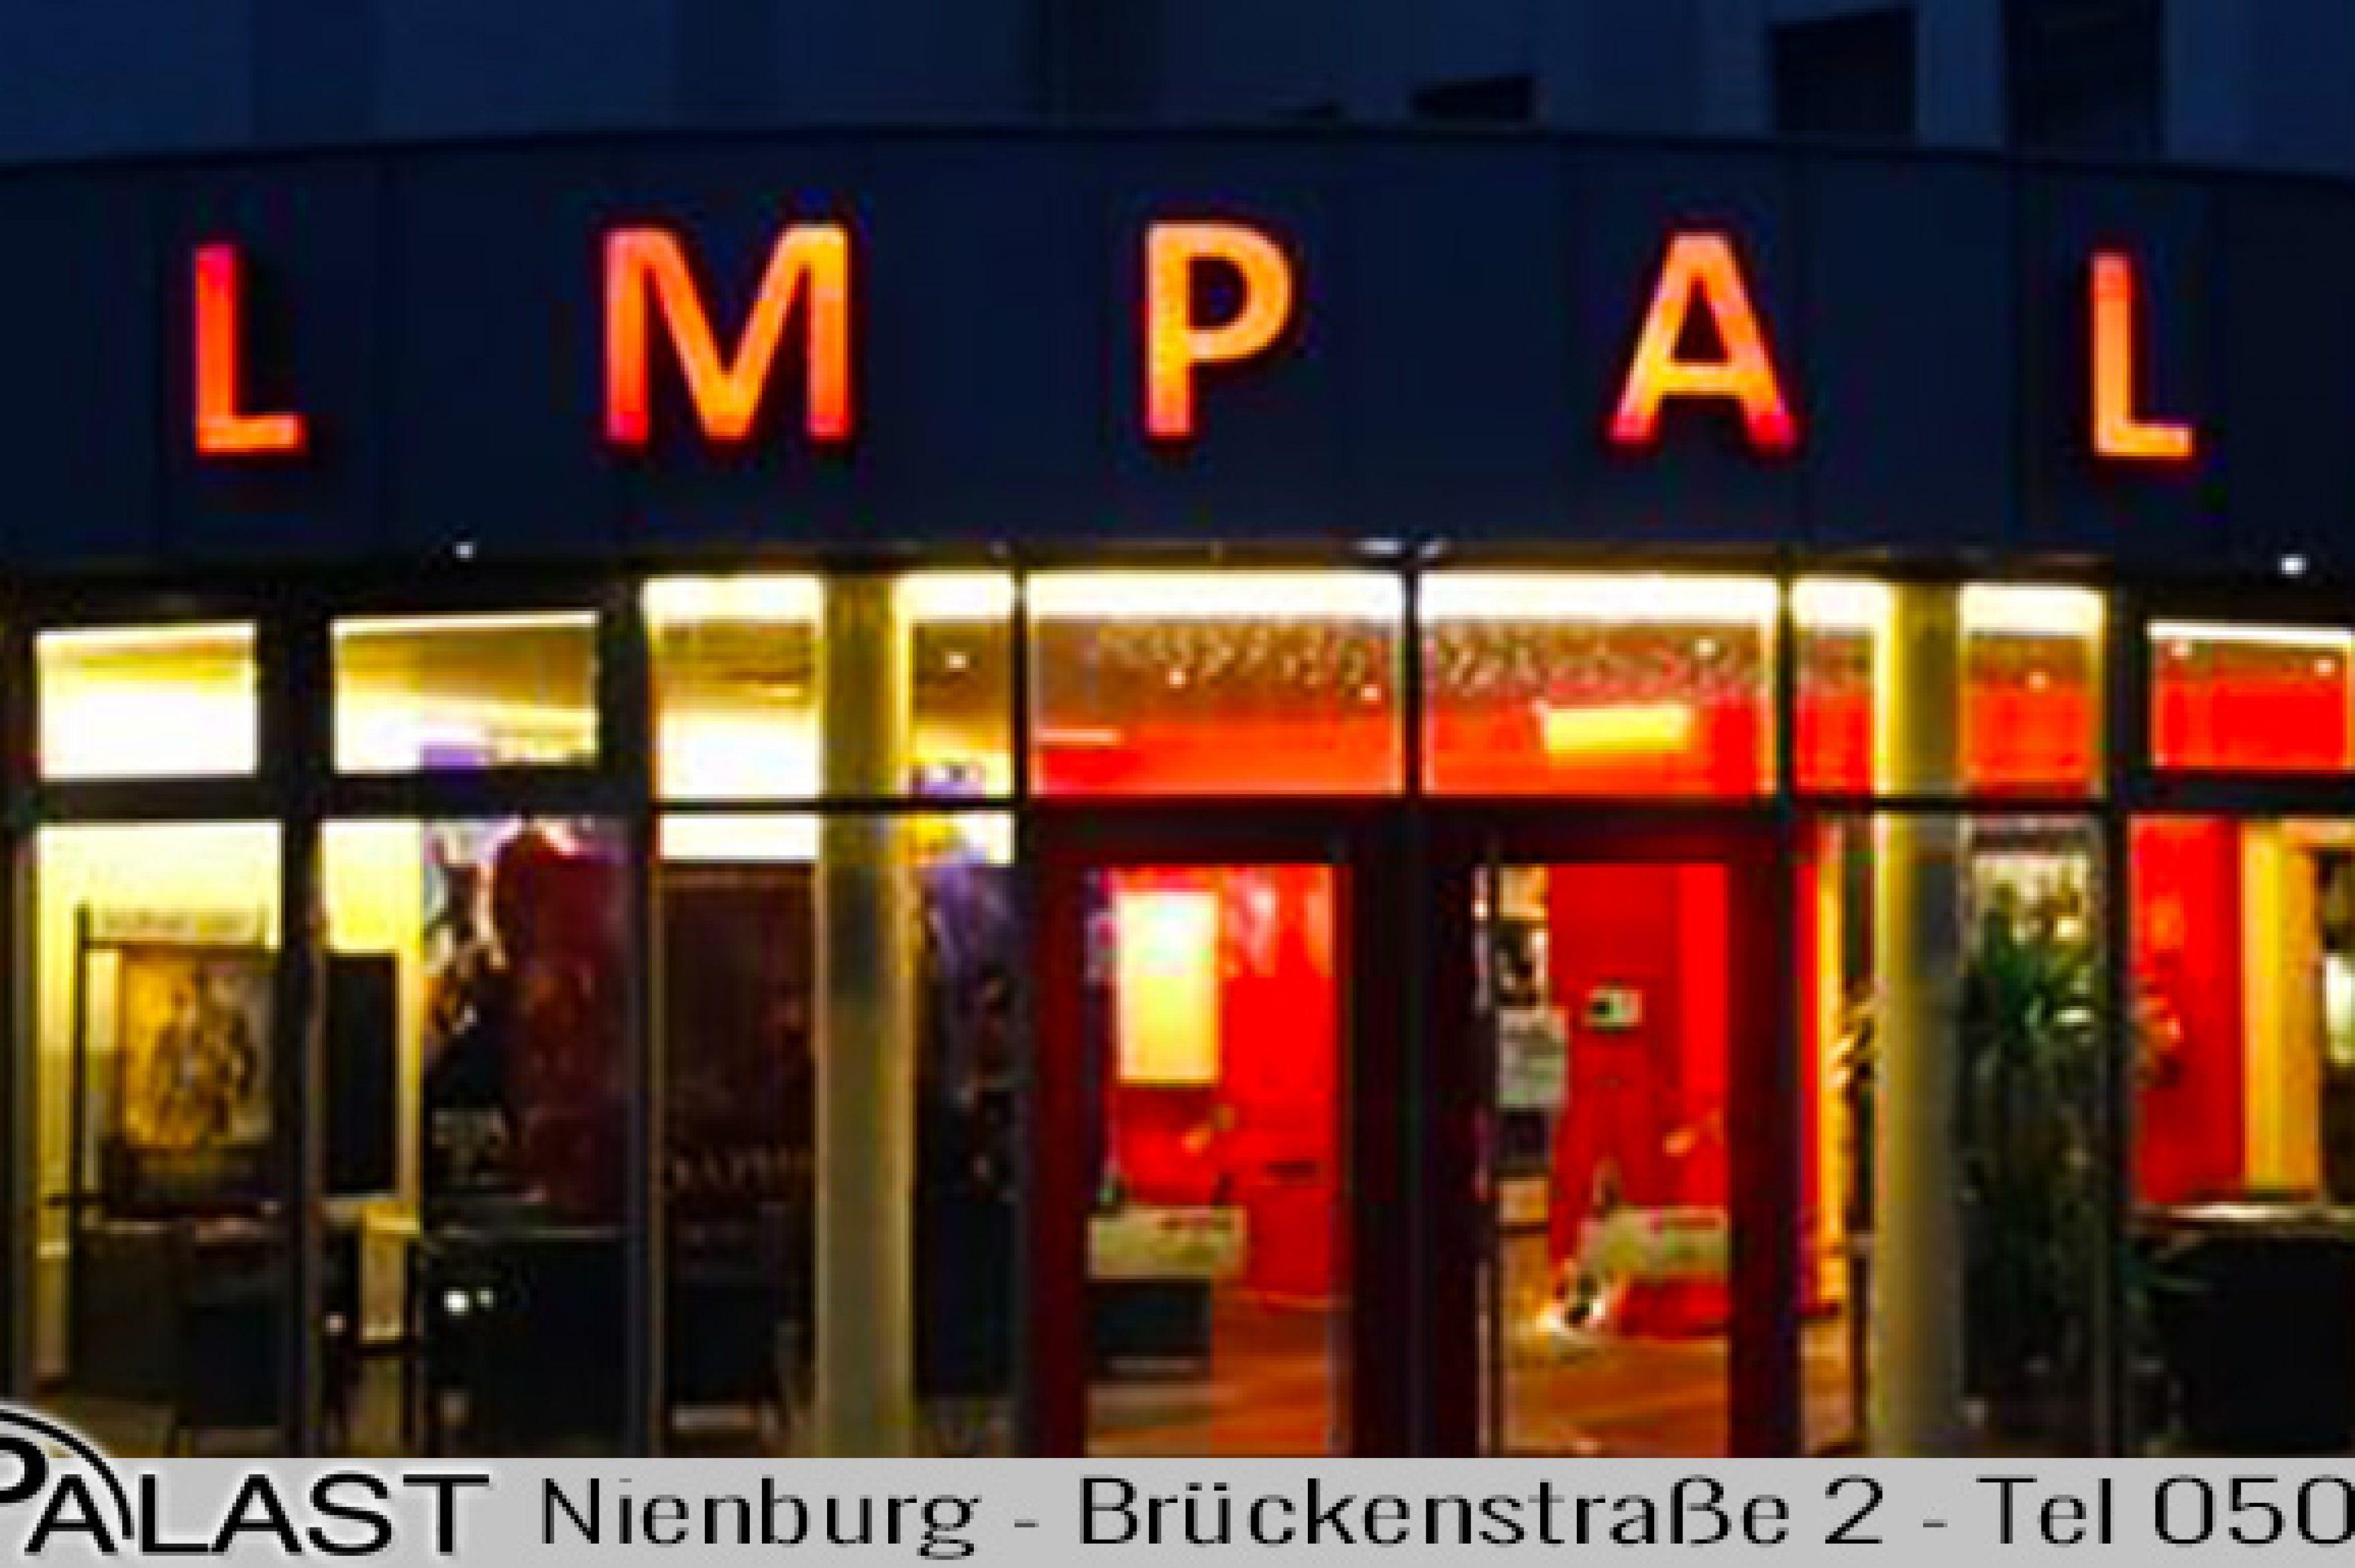 Update: Neuer Filmpalast